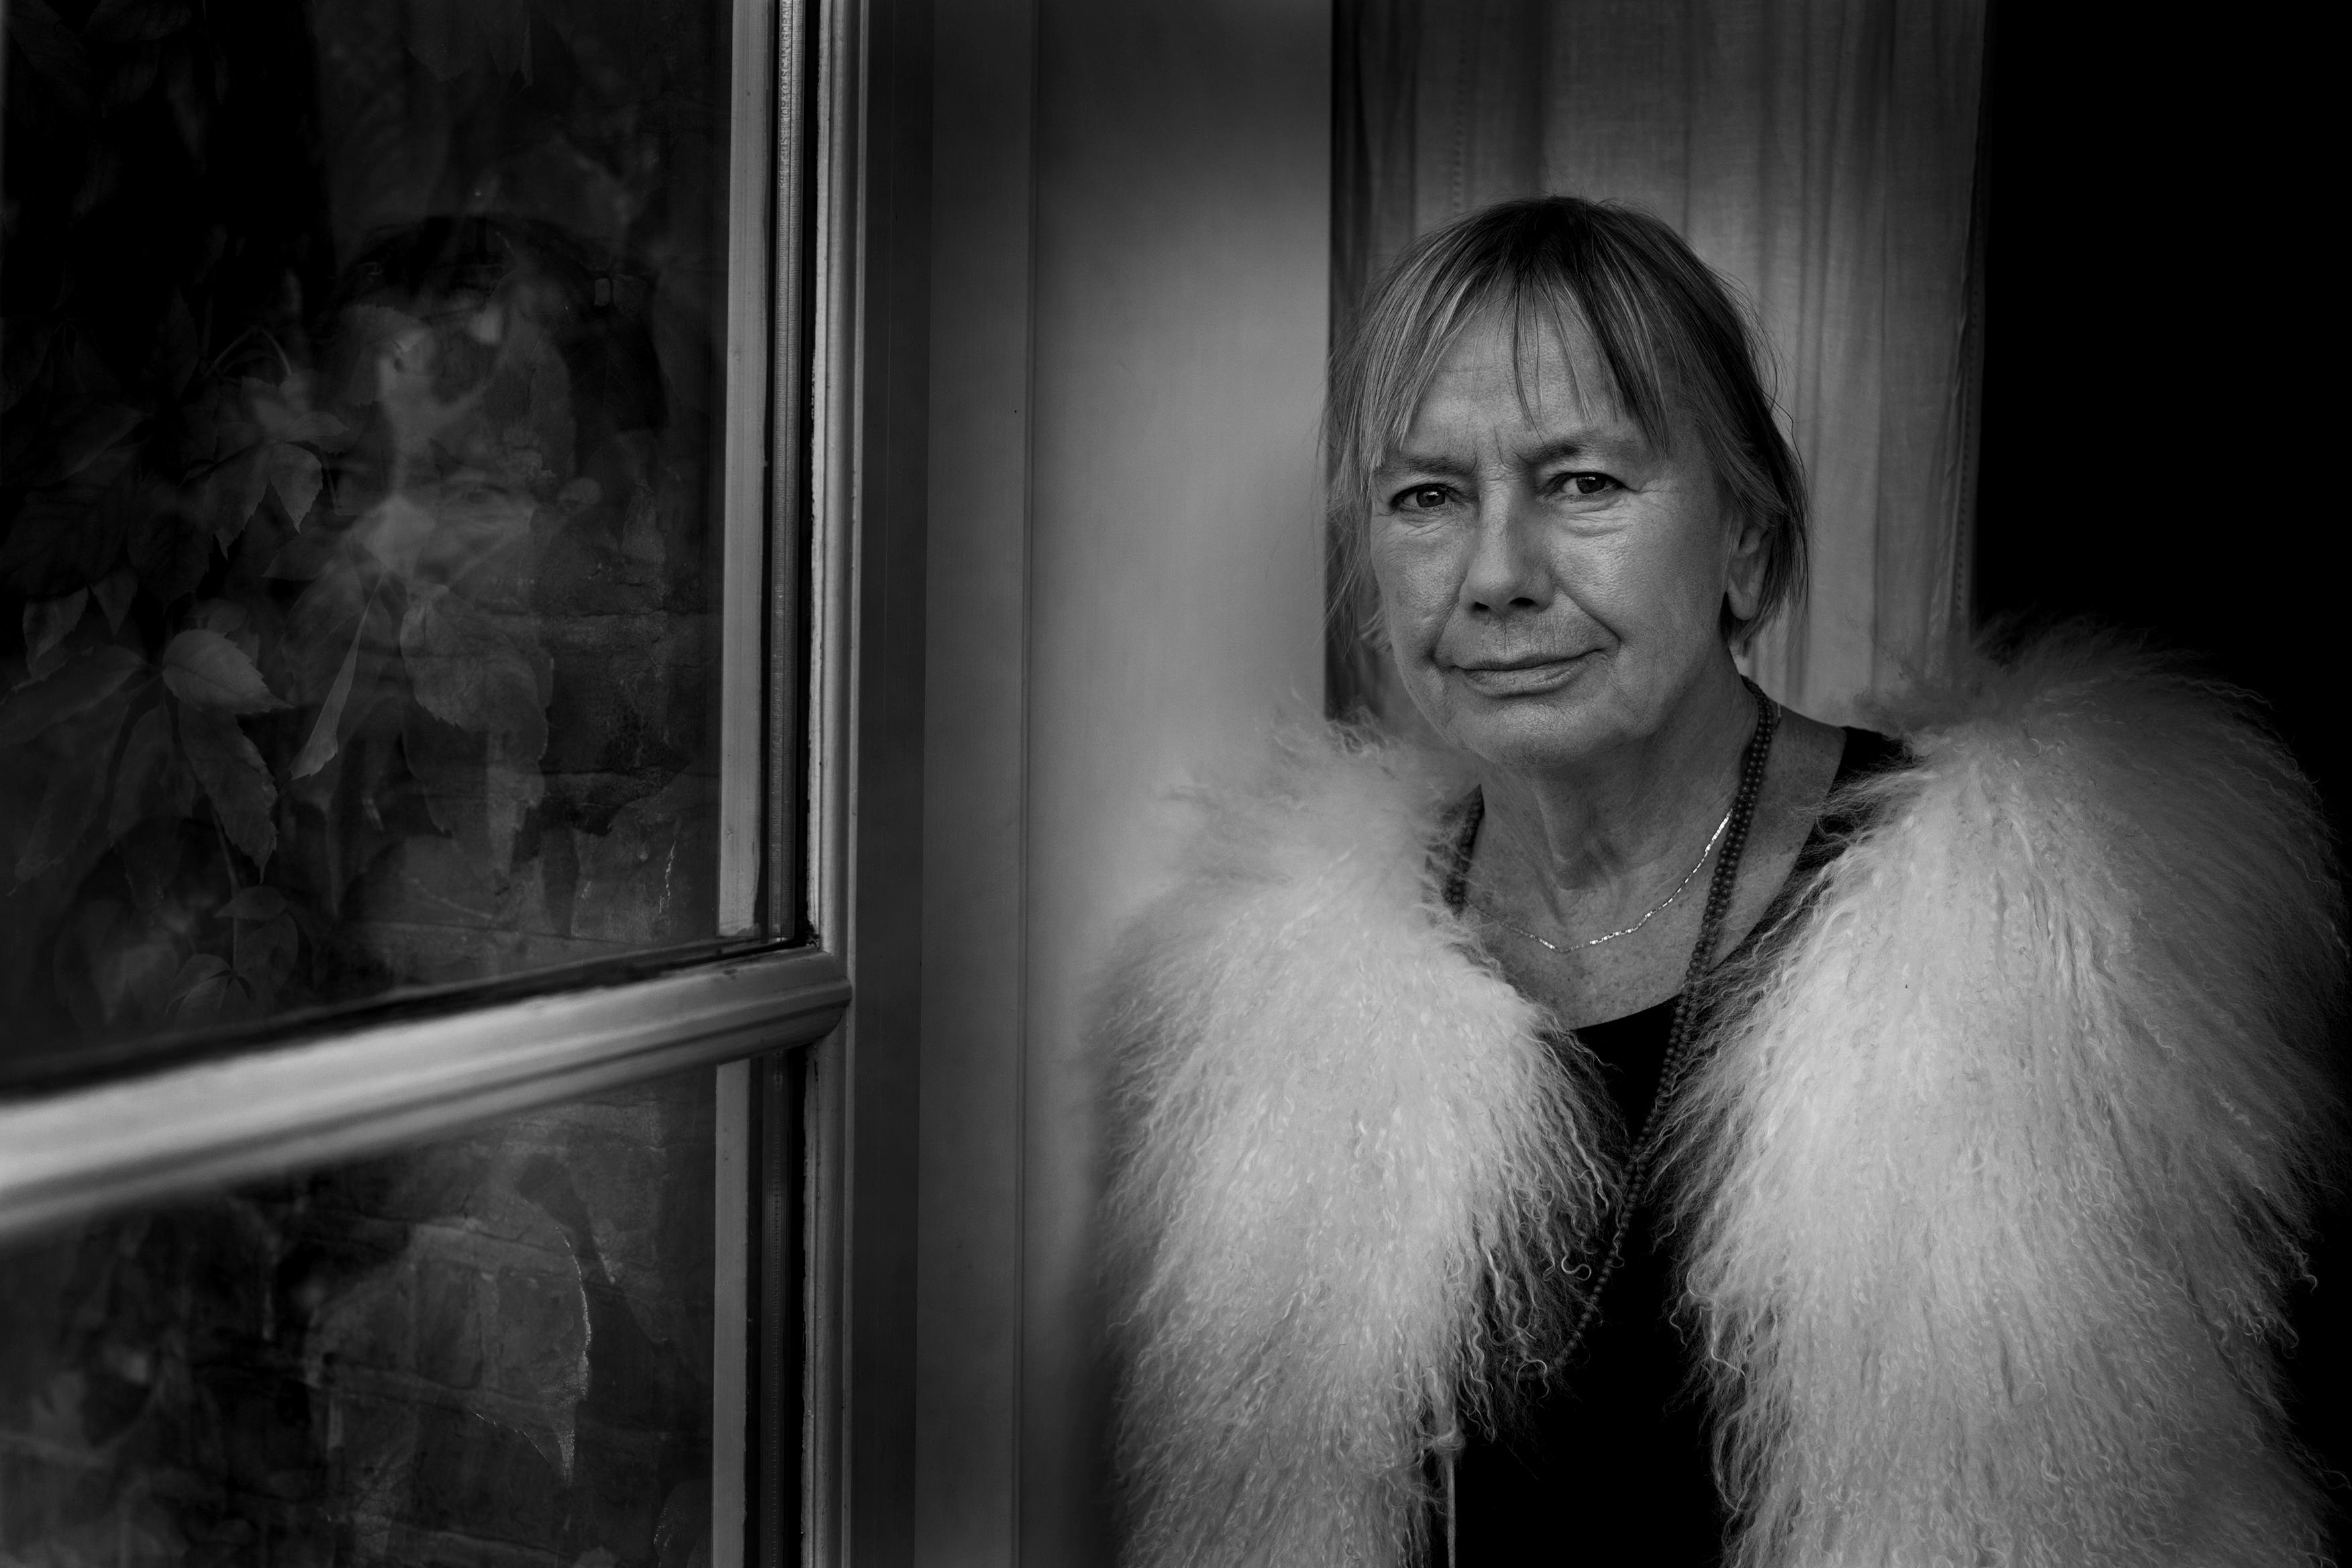 Danish advisor Tine Bryld